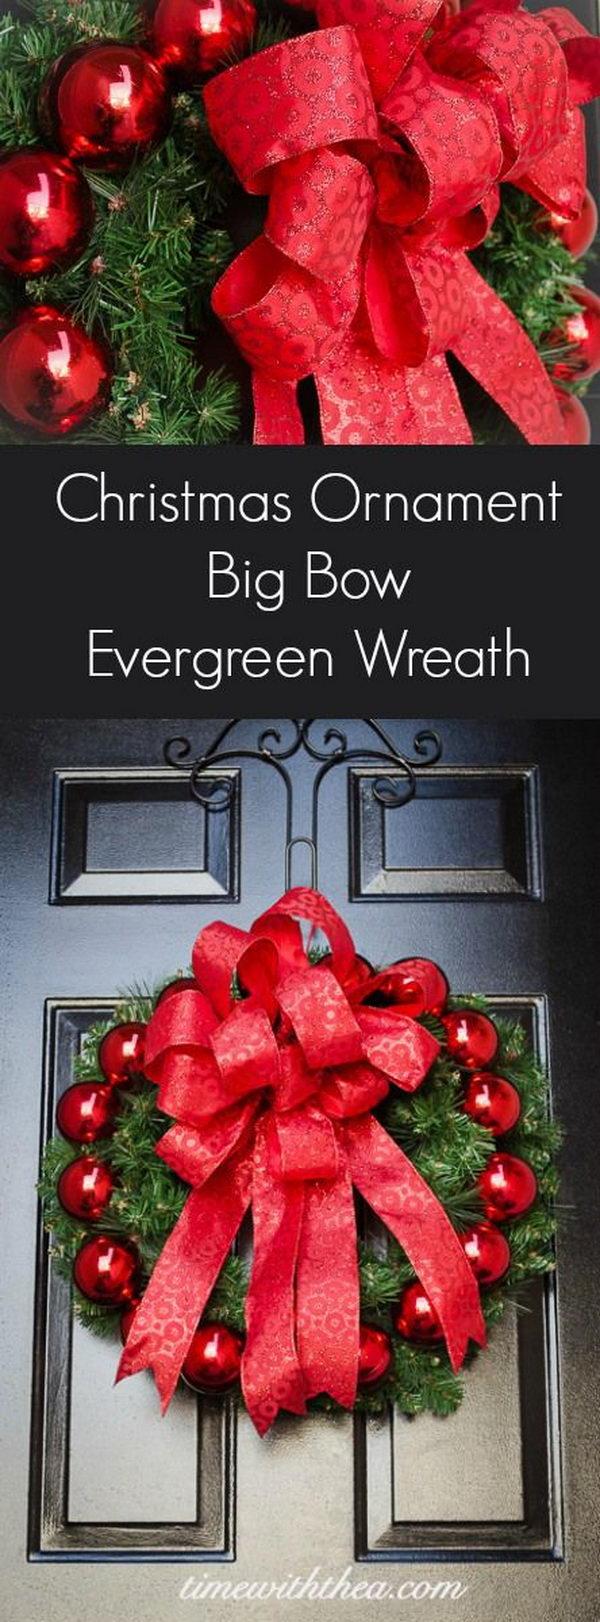 3 DIY Christmas Ornament Big Bow Evergreen Wreath